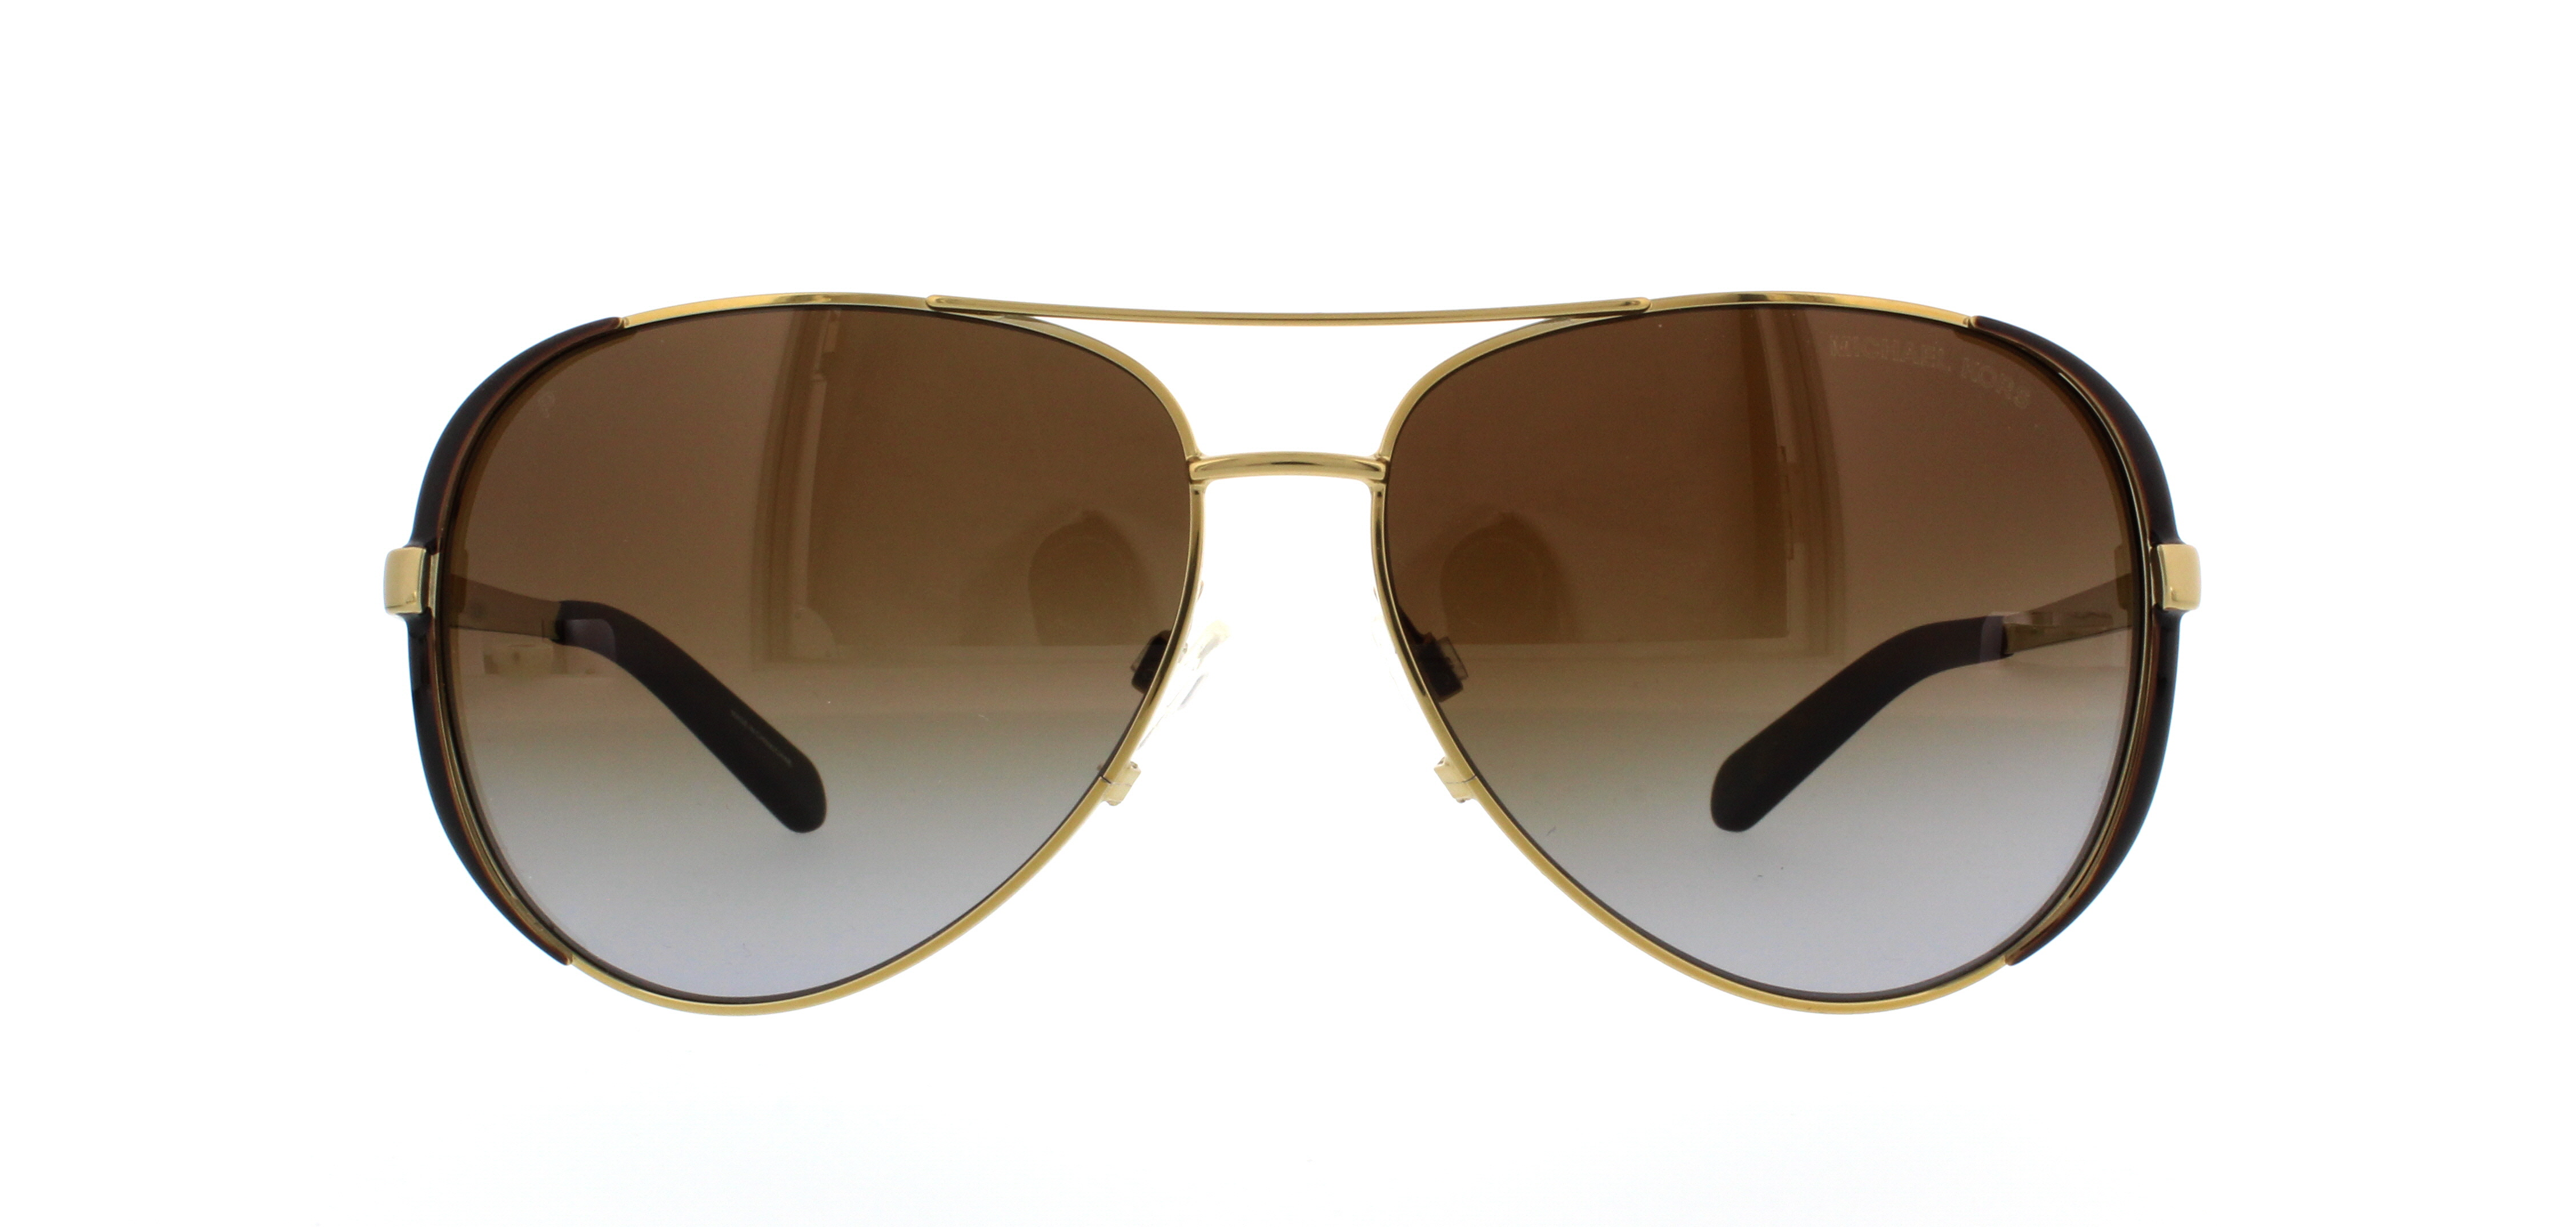 MICHAEL KORS Sunglasses MK5004 CHELSEA 1014T5 Gold Chocolate Brown 59MM f81f7e919a